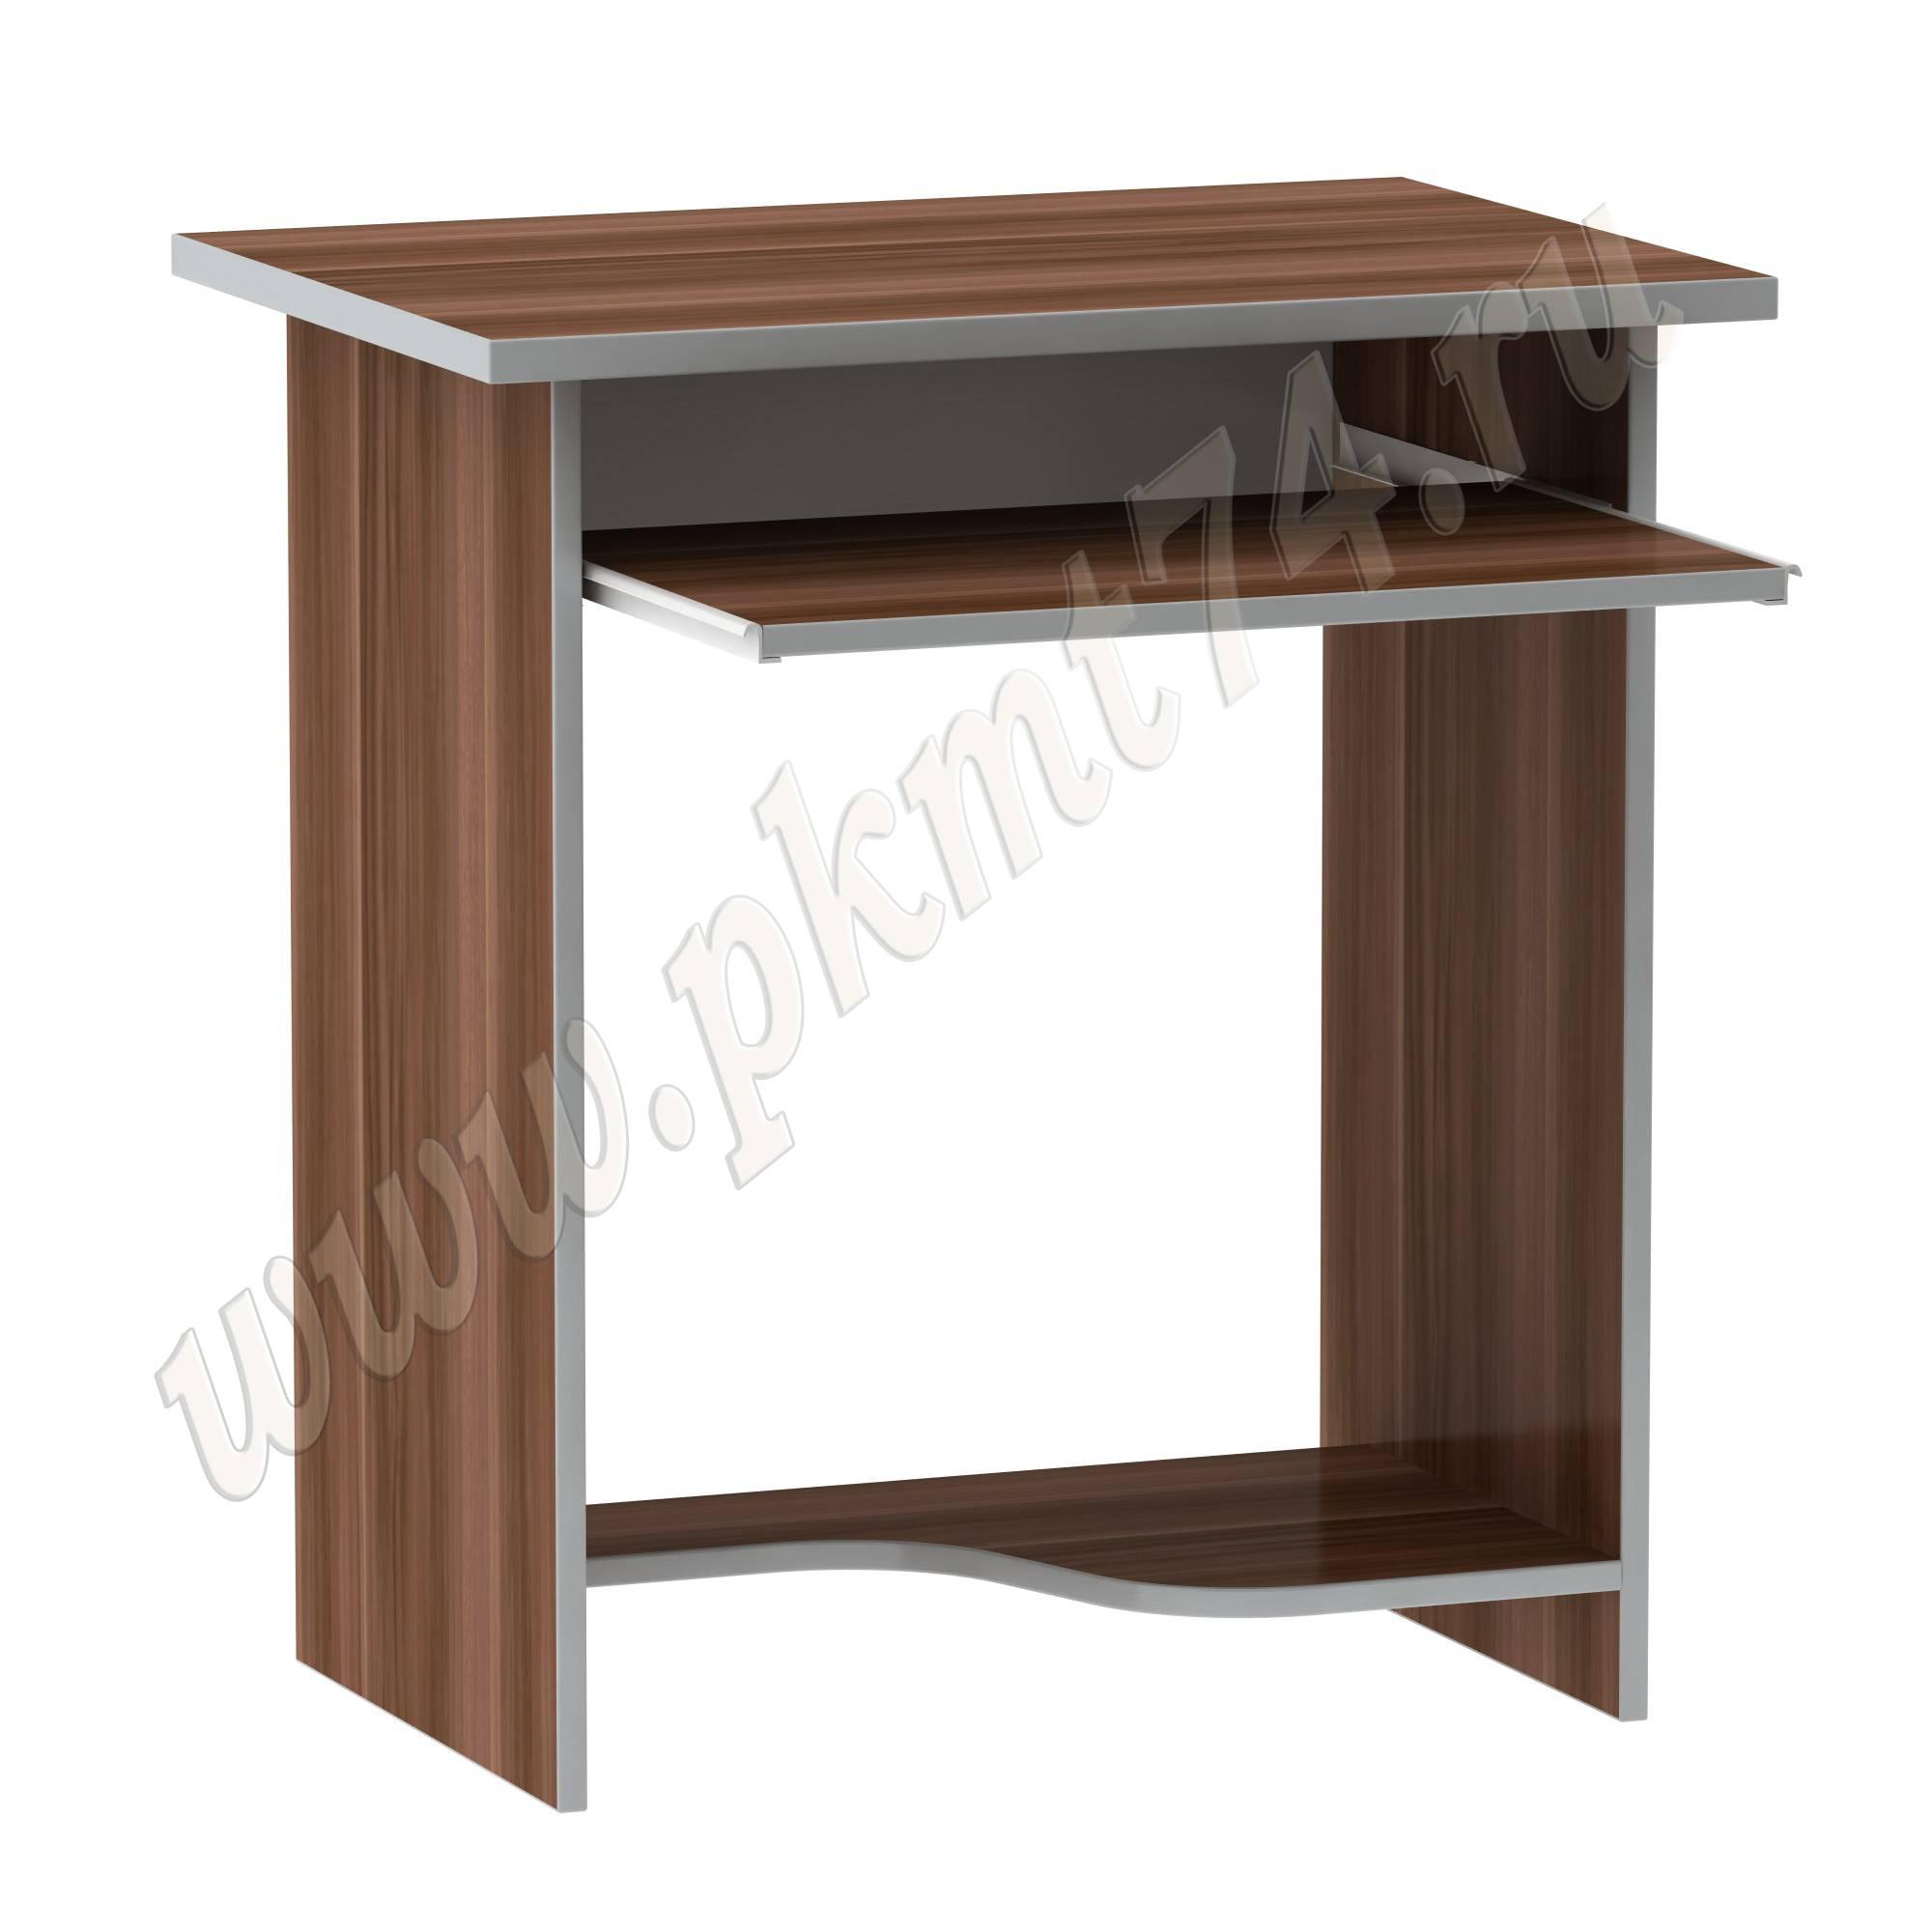 Компьютерный стол MT 07-7 Слива-Алюминий